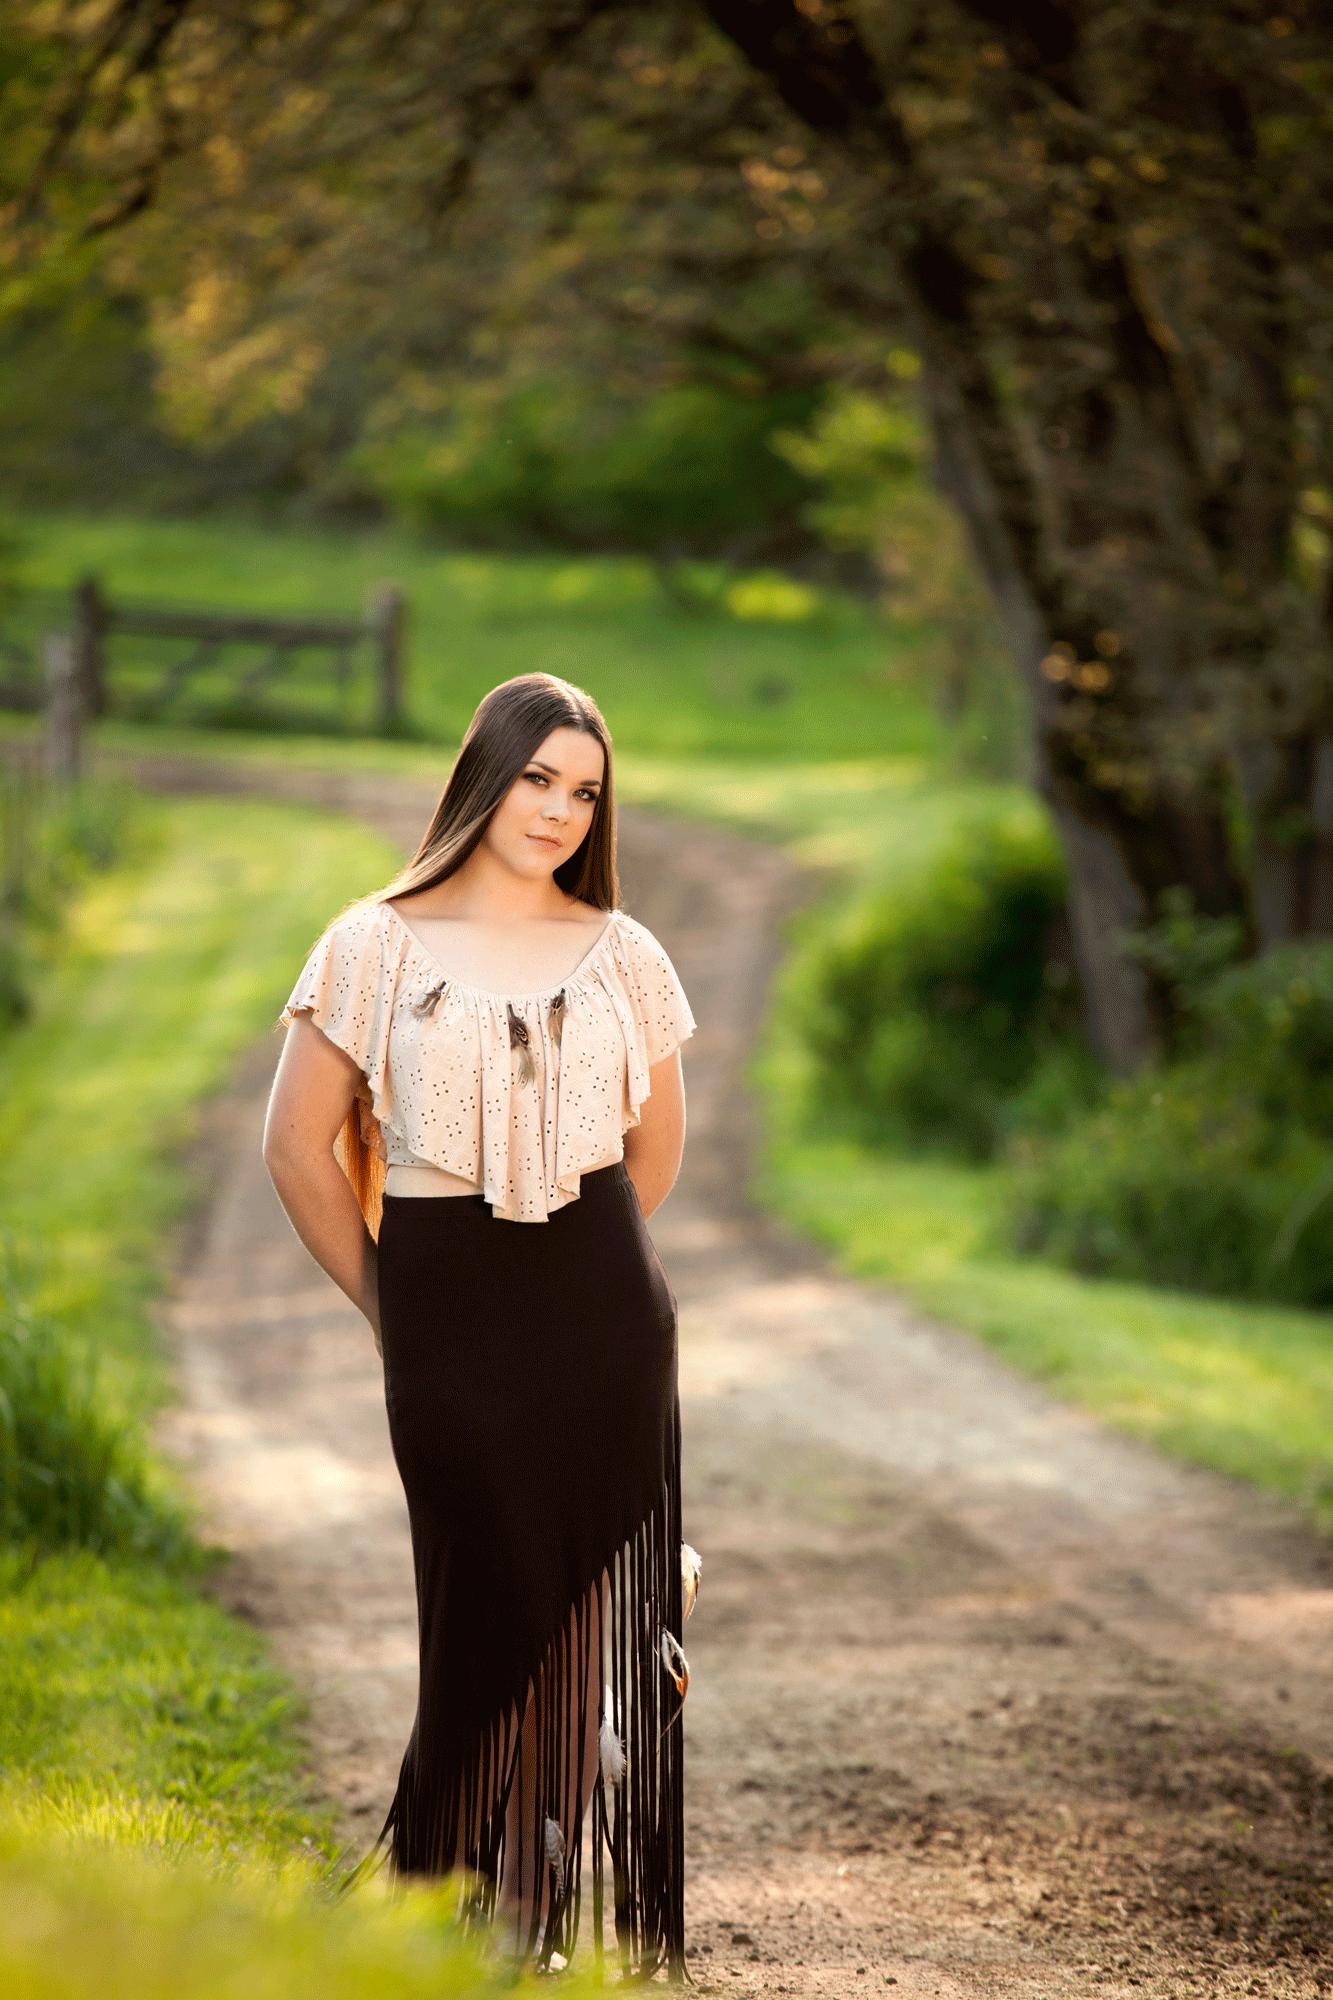 Madison-senior portraits-outdoors